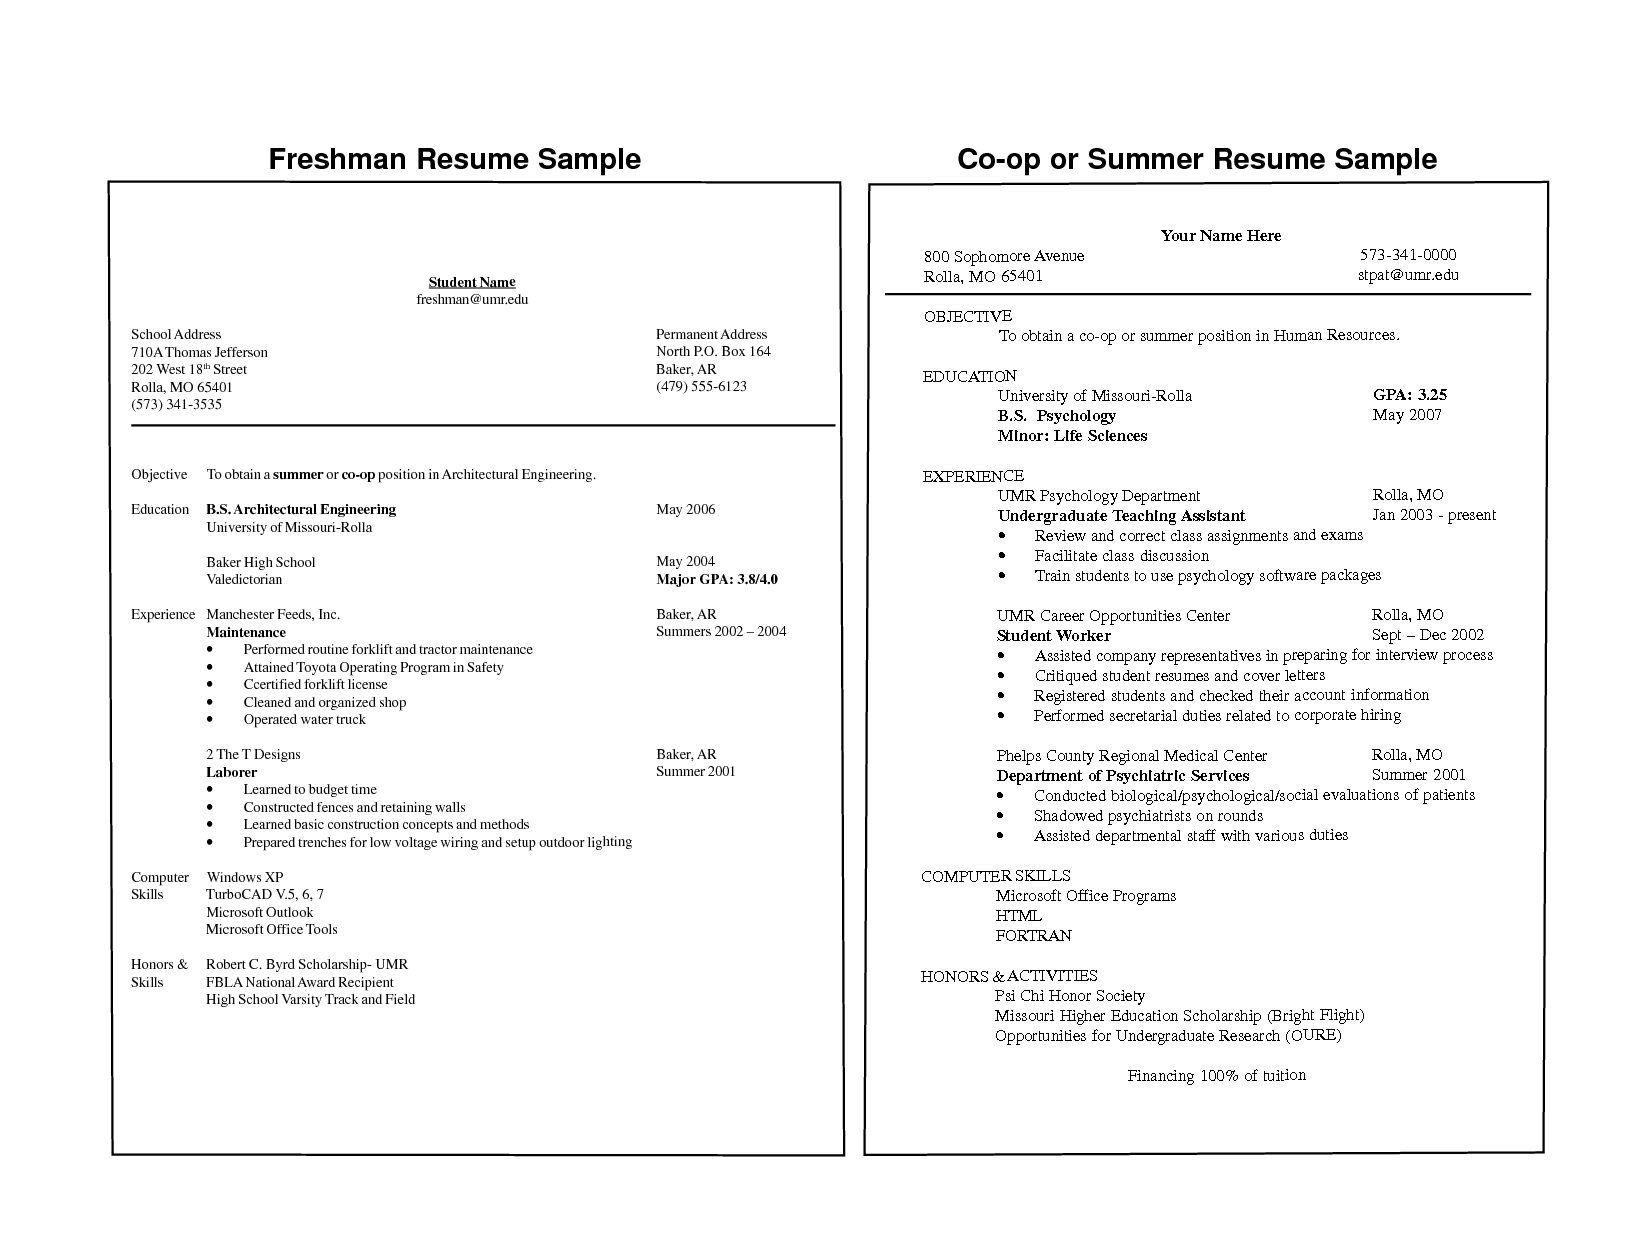 Freshman College Student Resume Examples Templates College Student Resume Examples Http Huntvilla I College Resume Template College Resume Job Resume Samples